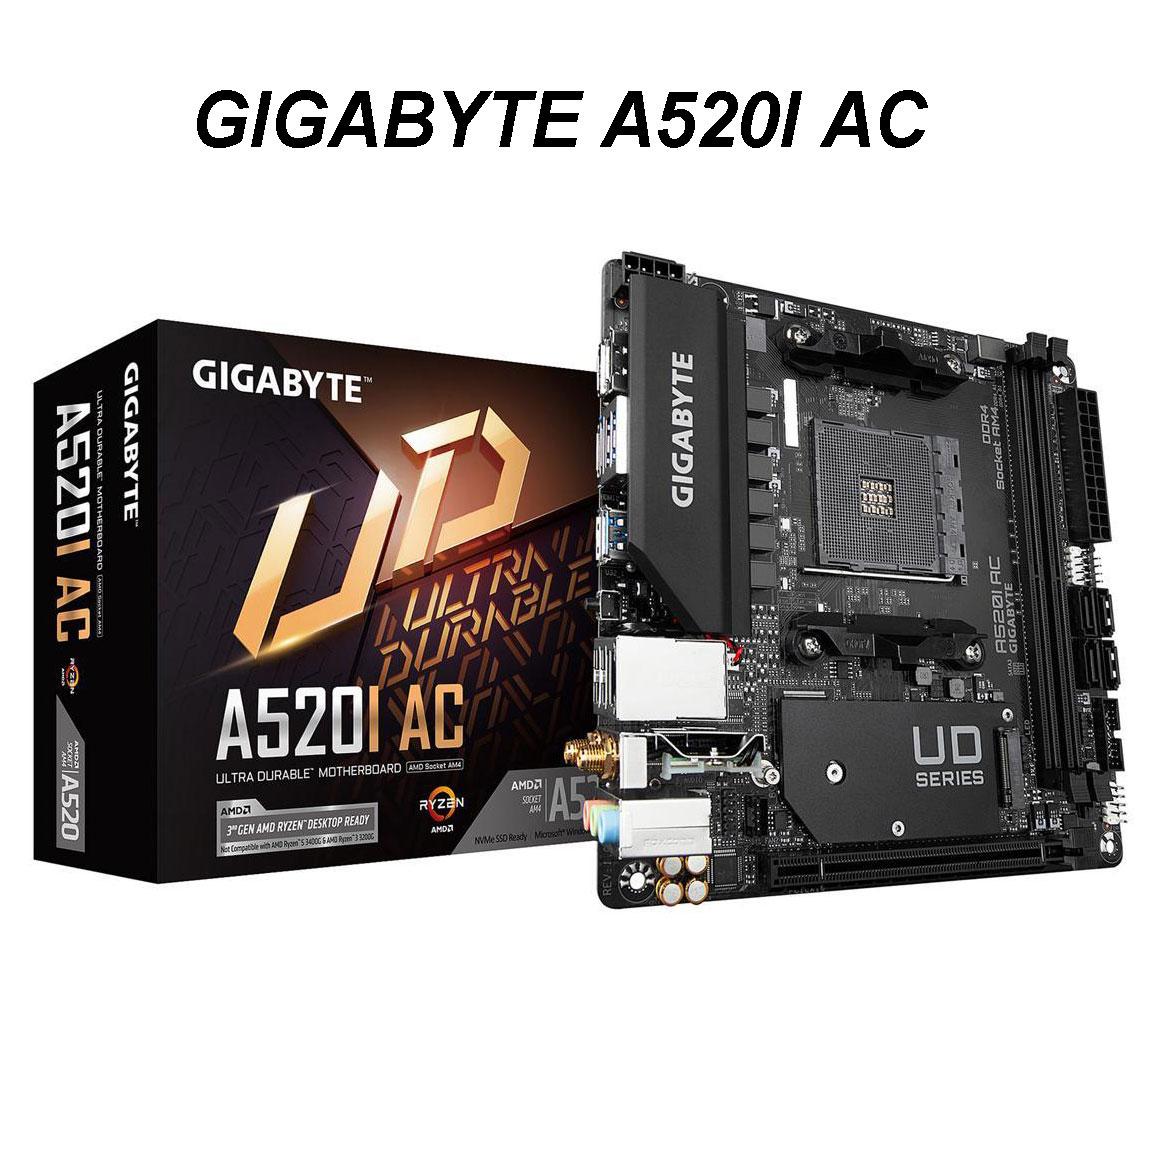 Gigabyte a520i ac placa-mãe mitx direto 6 fases digital pwm com 55a drmos gaming gbe lan intel wifi + bluetooth amd am4 soquete